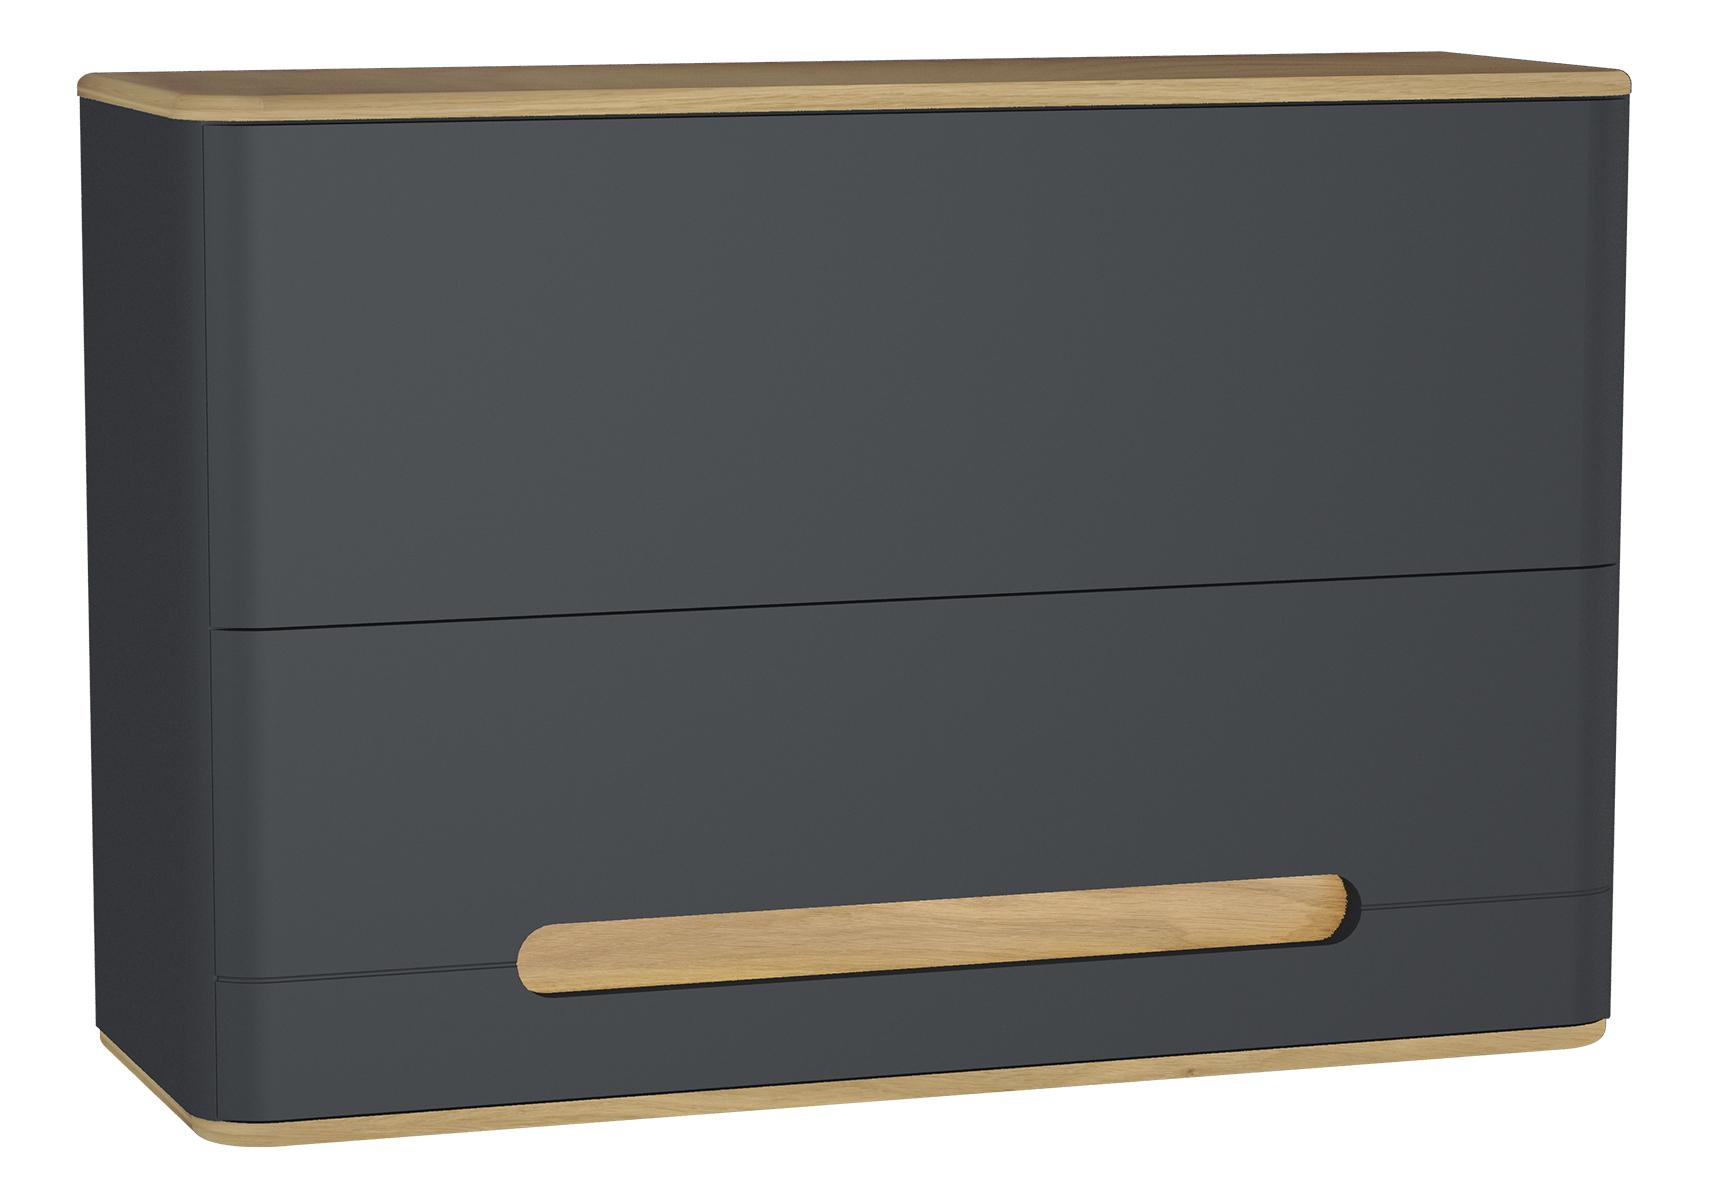 Sento module supérieur, 105 cm, 1 tiroir intérieur, anthraciteacite mat